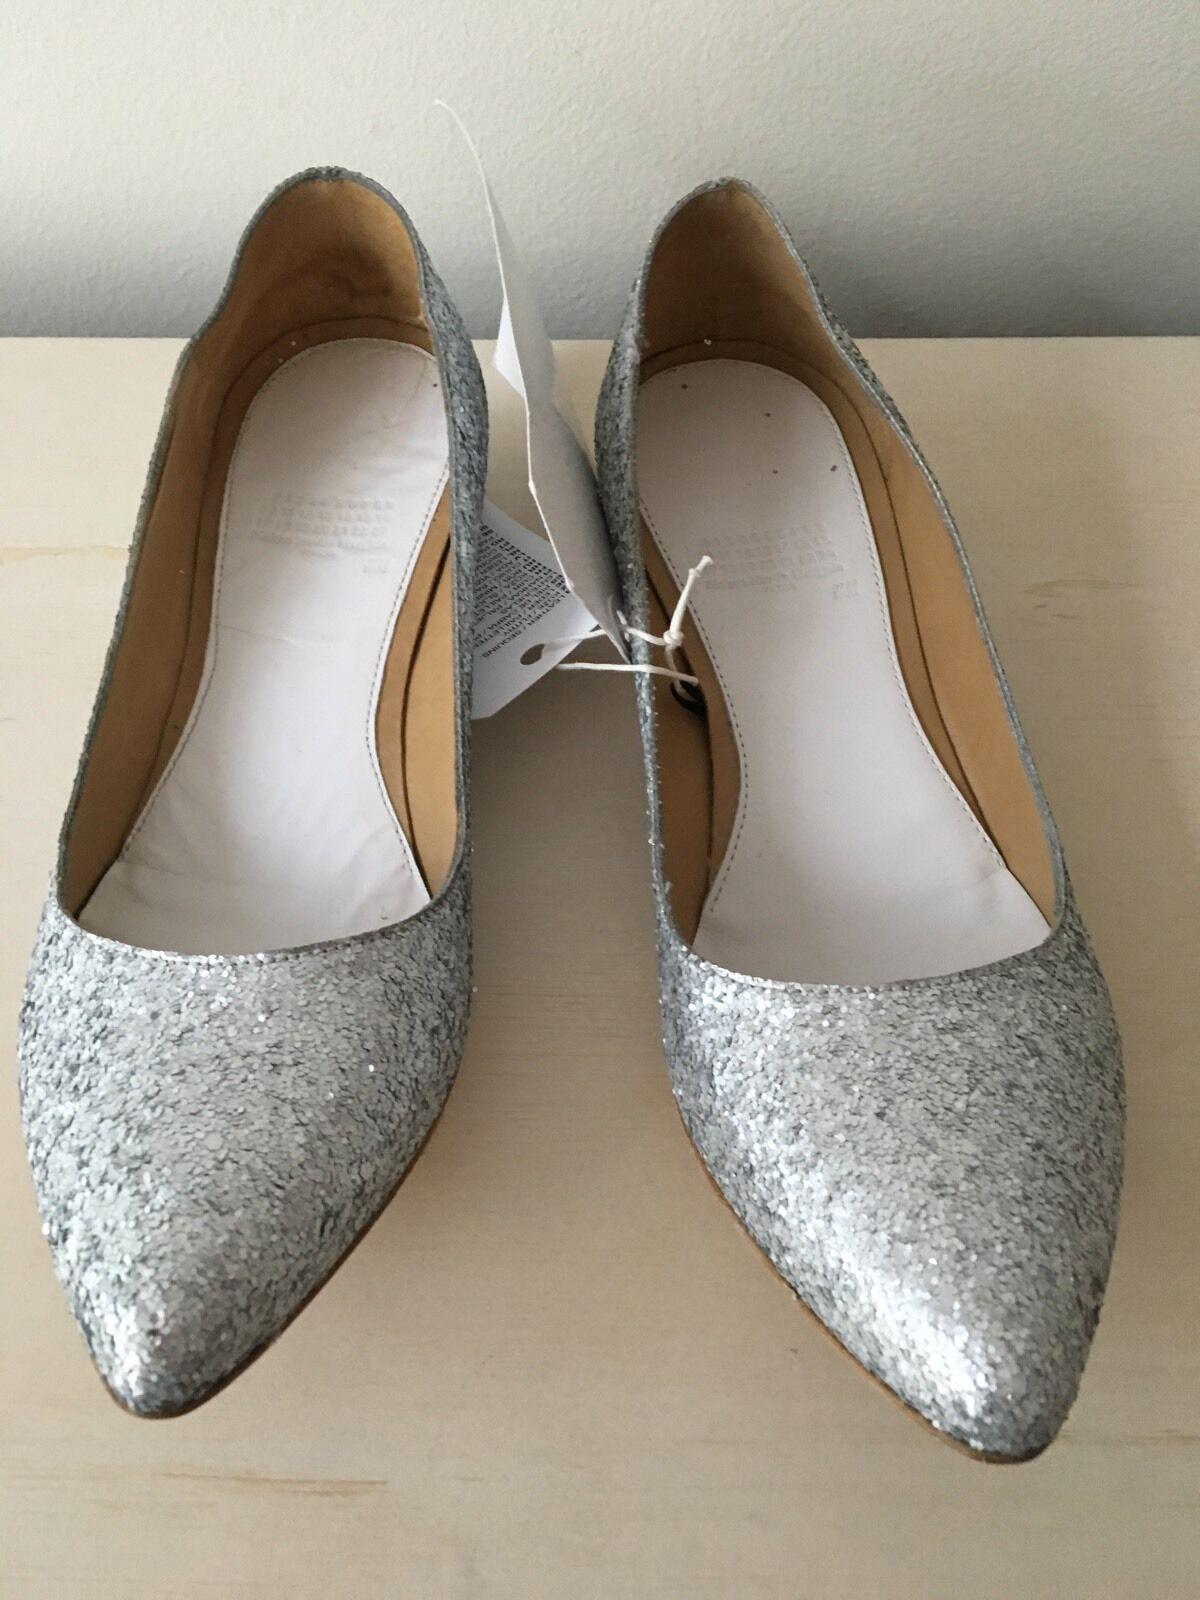 NIB Maison Martin Margiela H&M Silver Glitter Hidden Heels Heels Heels Flats 39/ US 8 ec15bd